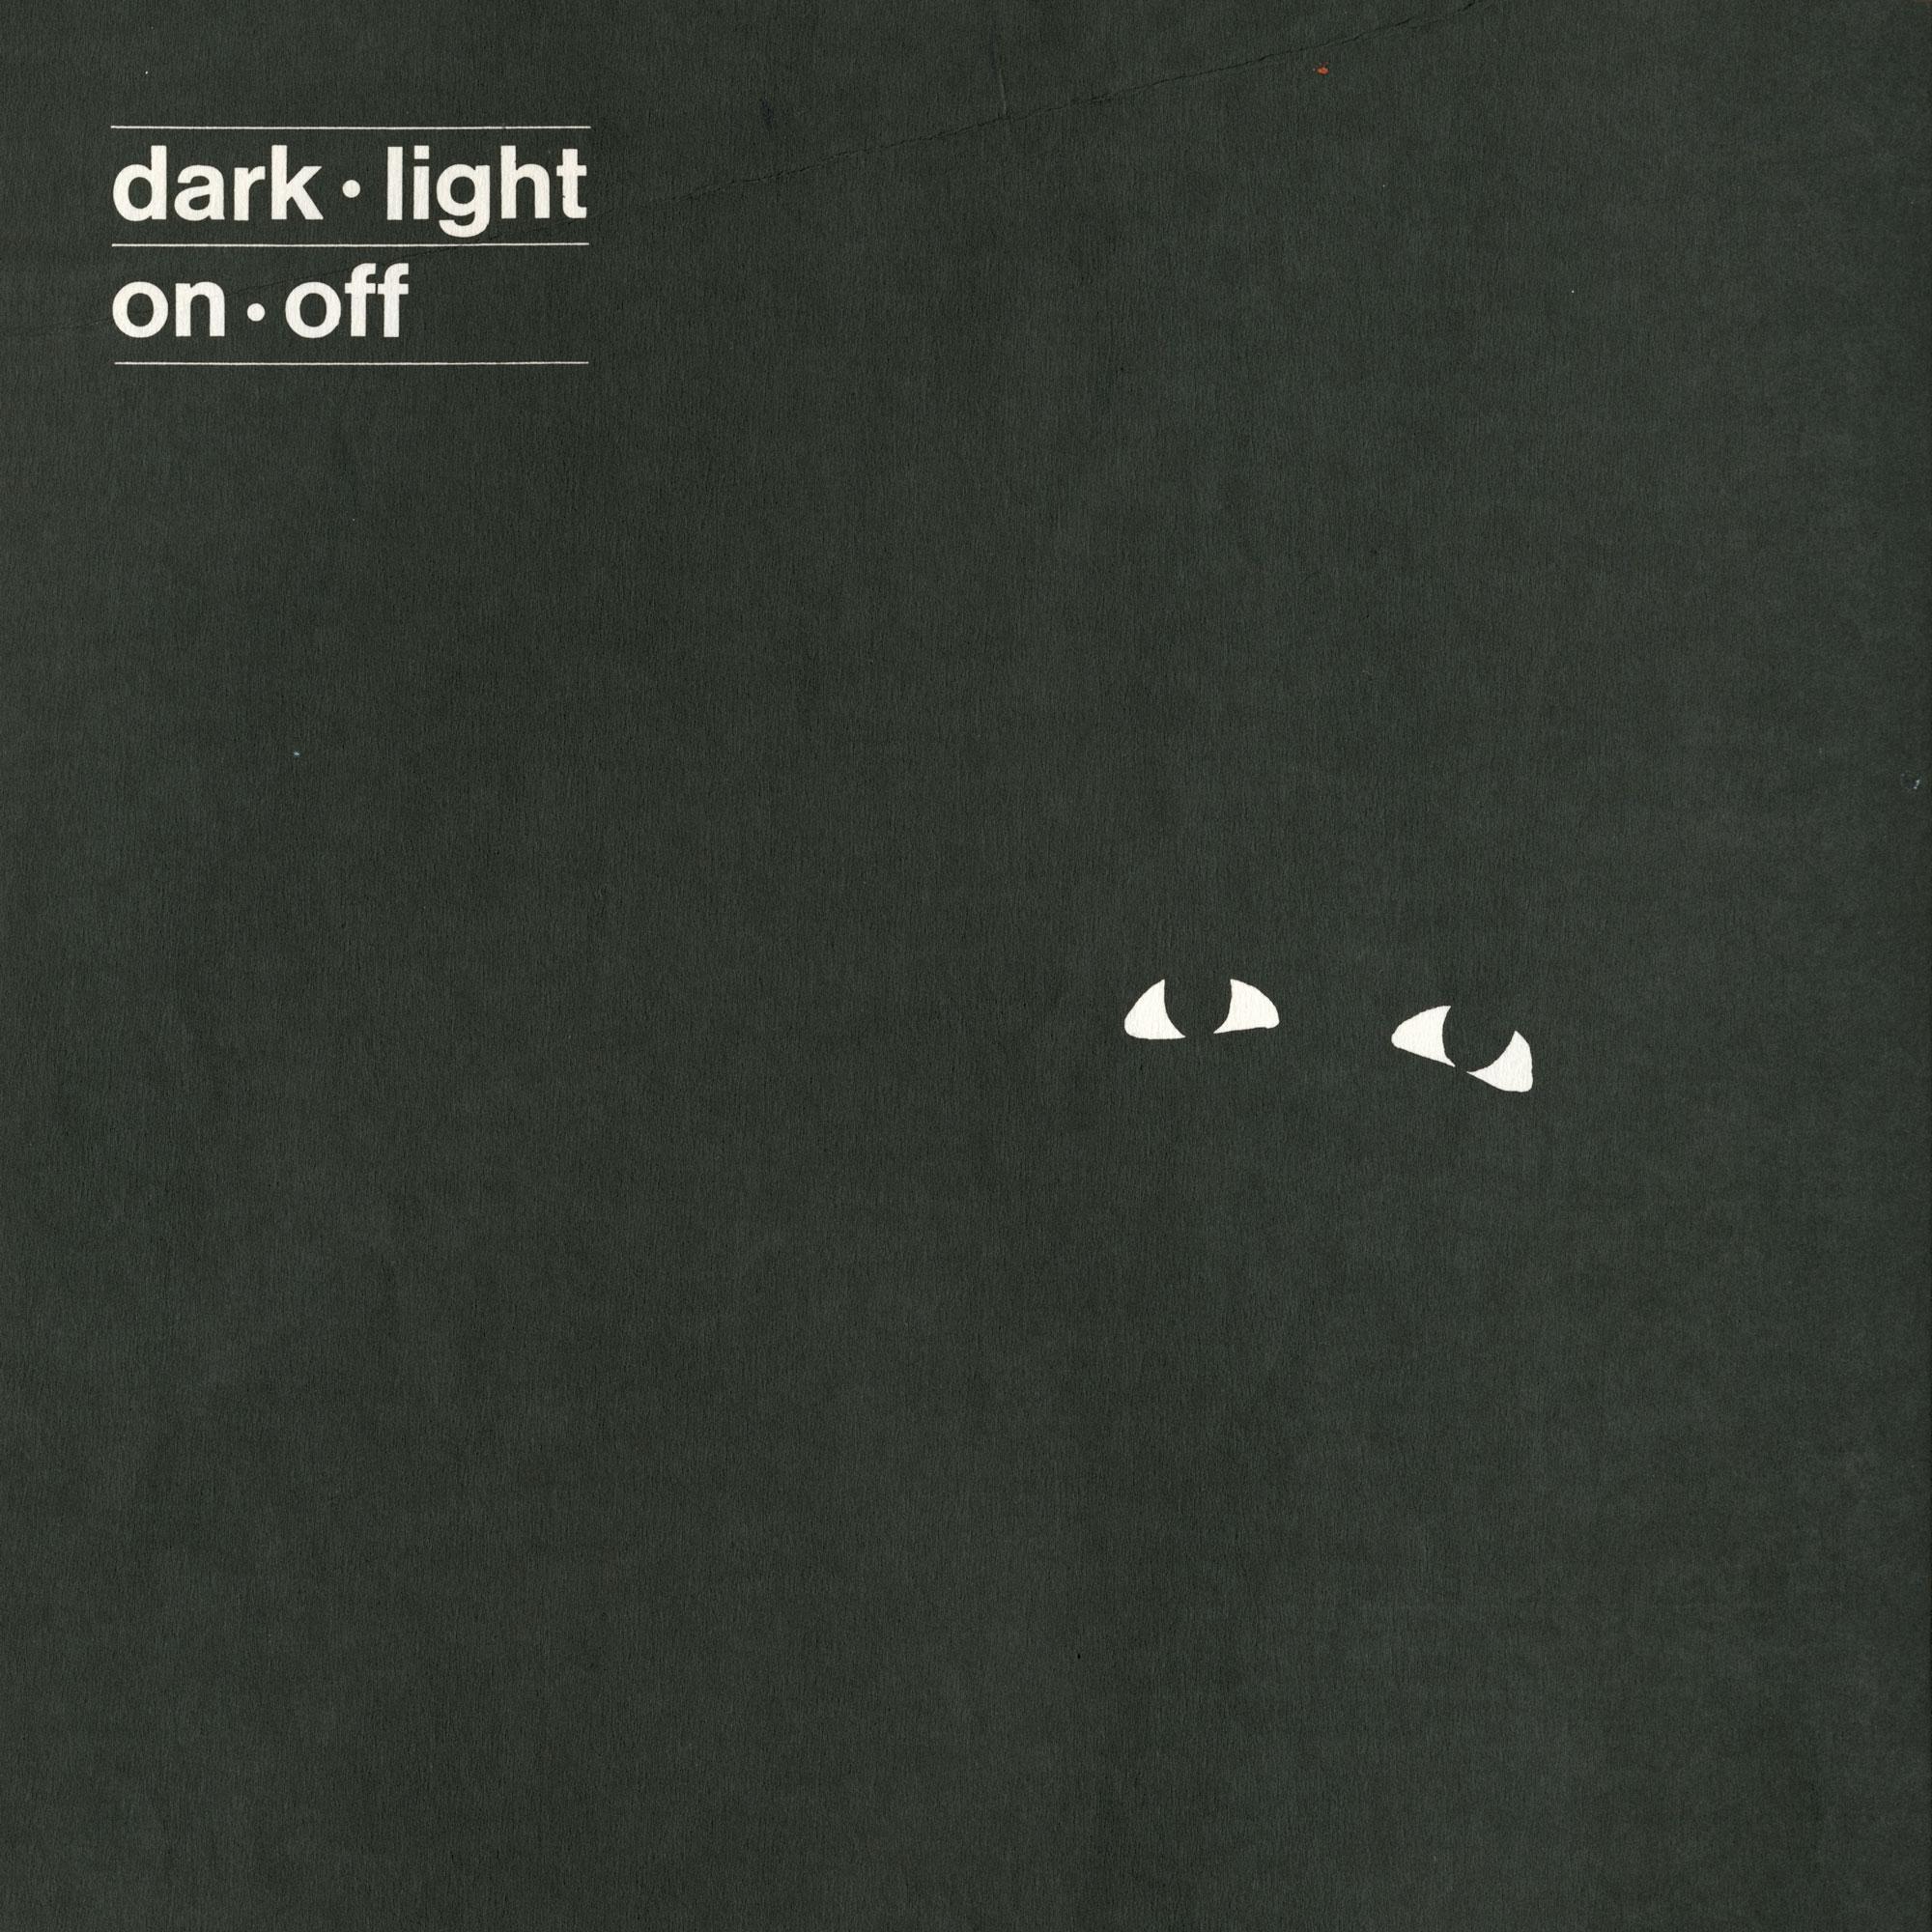 dark2.jpg